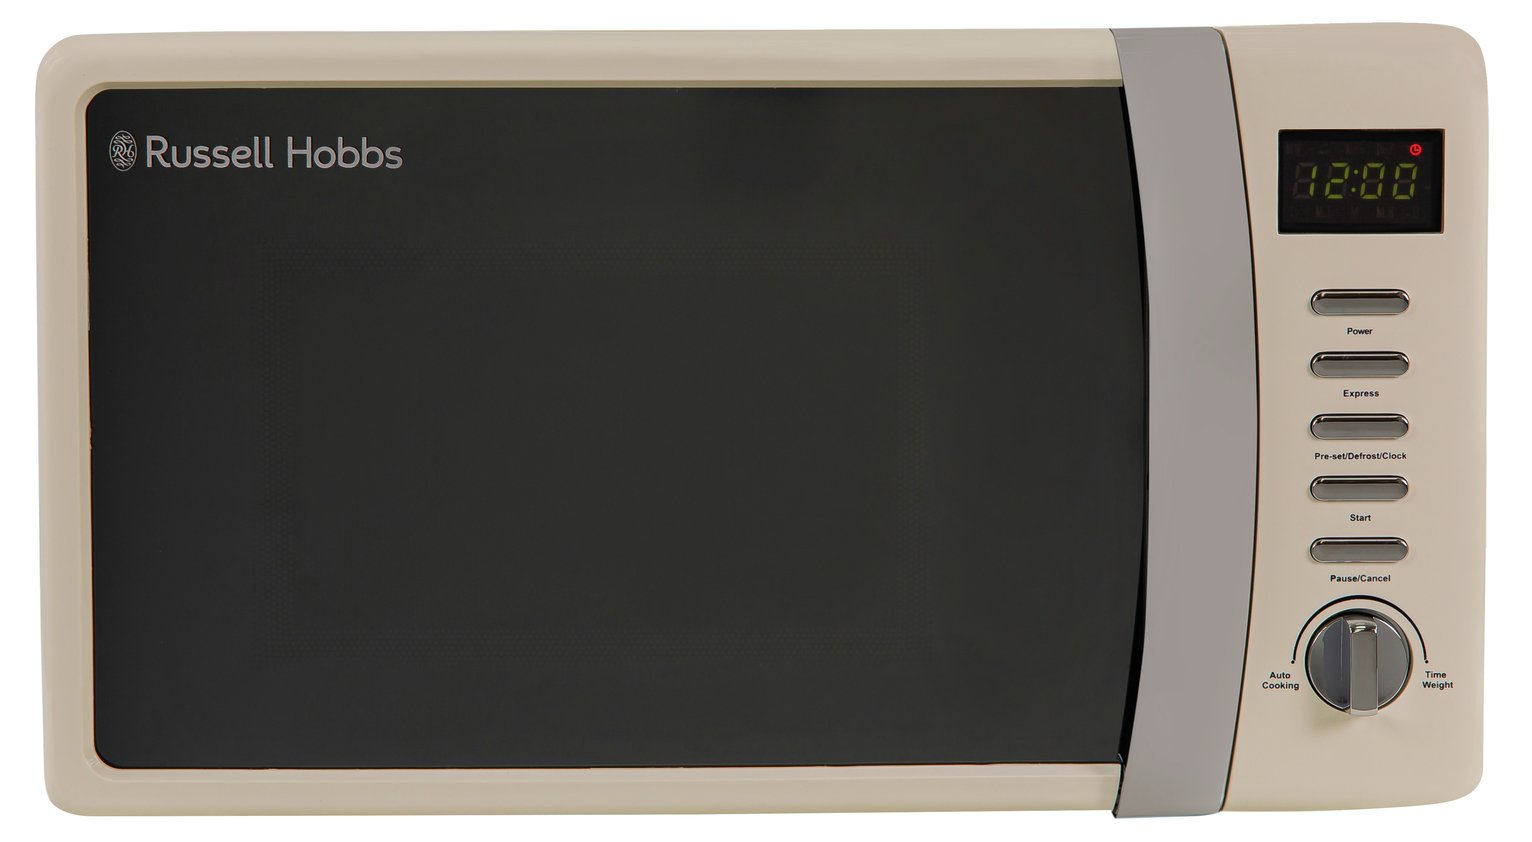 Russell Hobbs 700W Standard Microwave RHMD712 - Cream